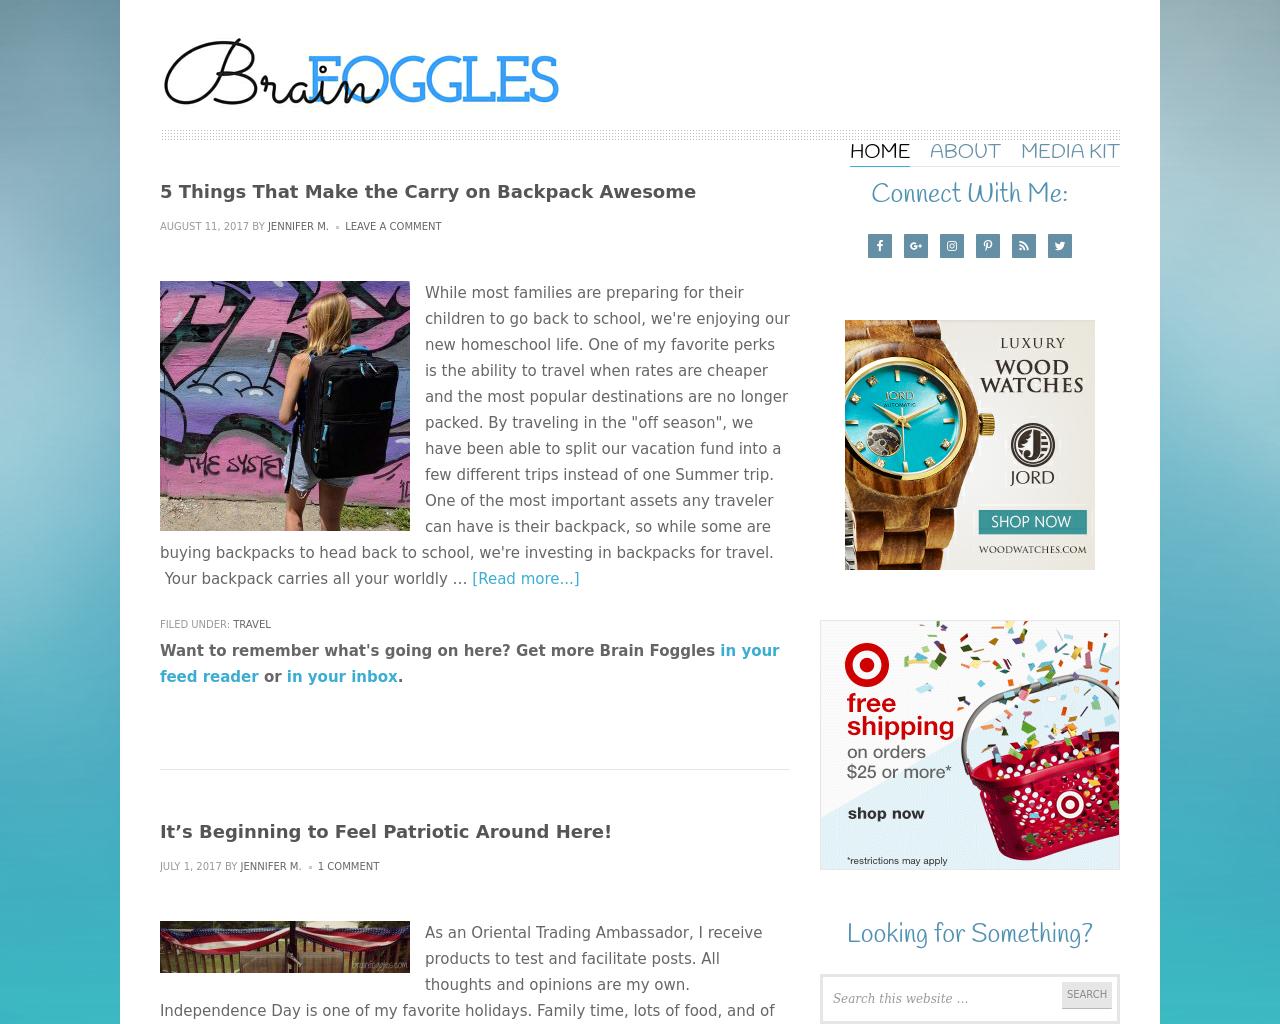 Brain-Foggles-Advertising-Reviews-Pricing